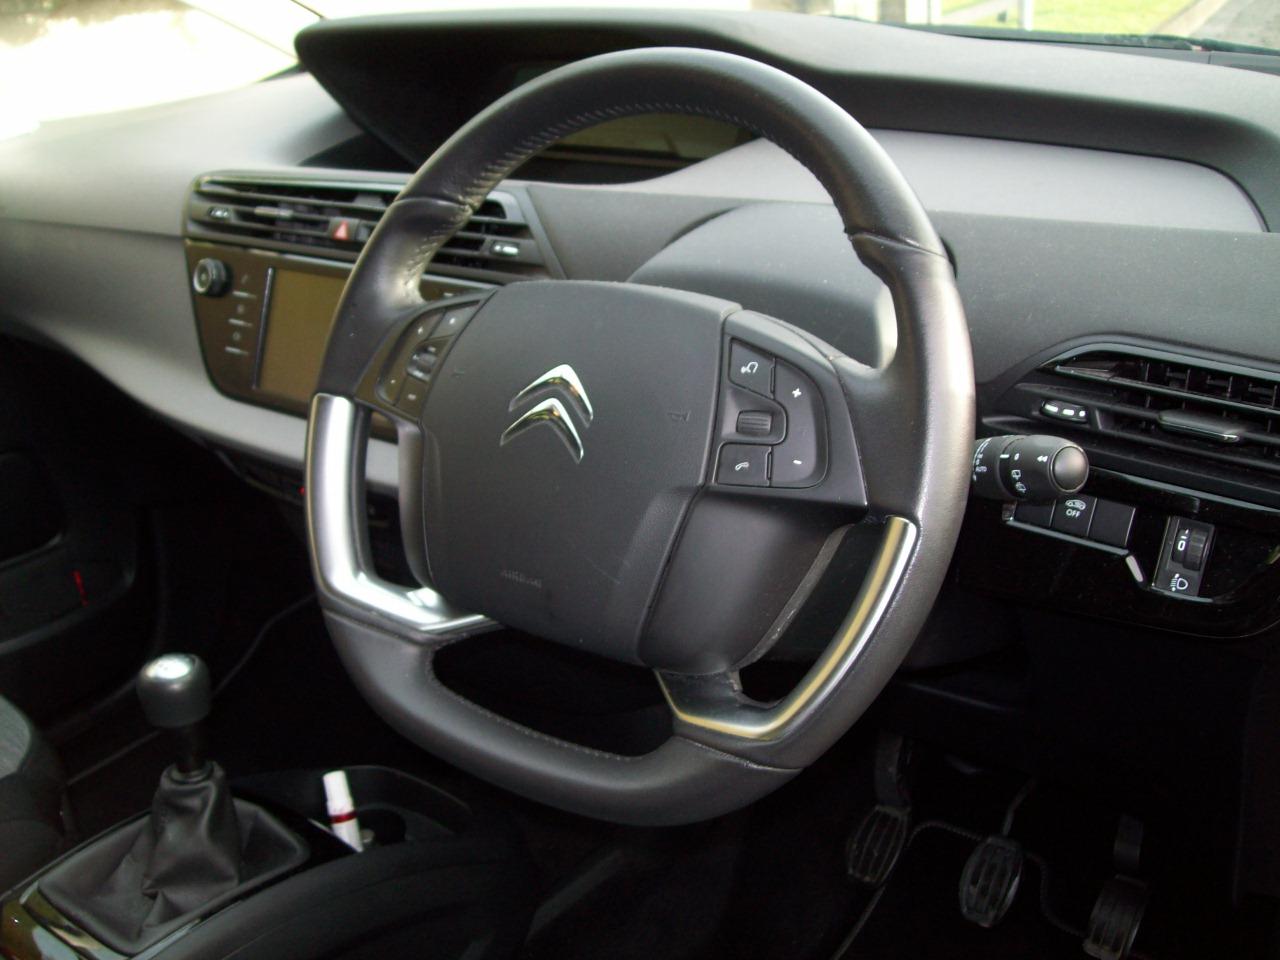 2017 Citroen C4 Grand Picasso Diesel Manual – Derek Loane Motors full